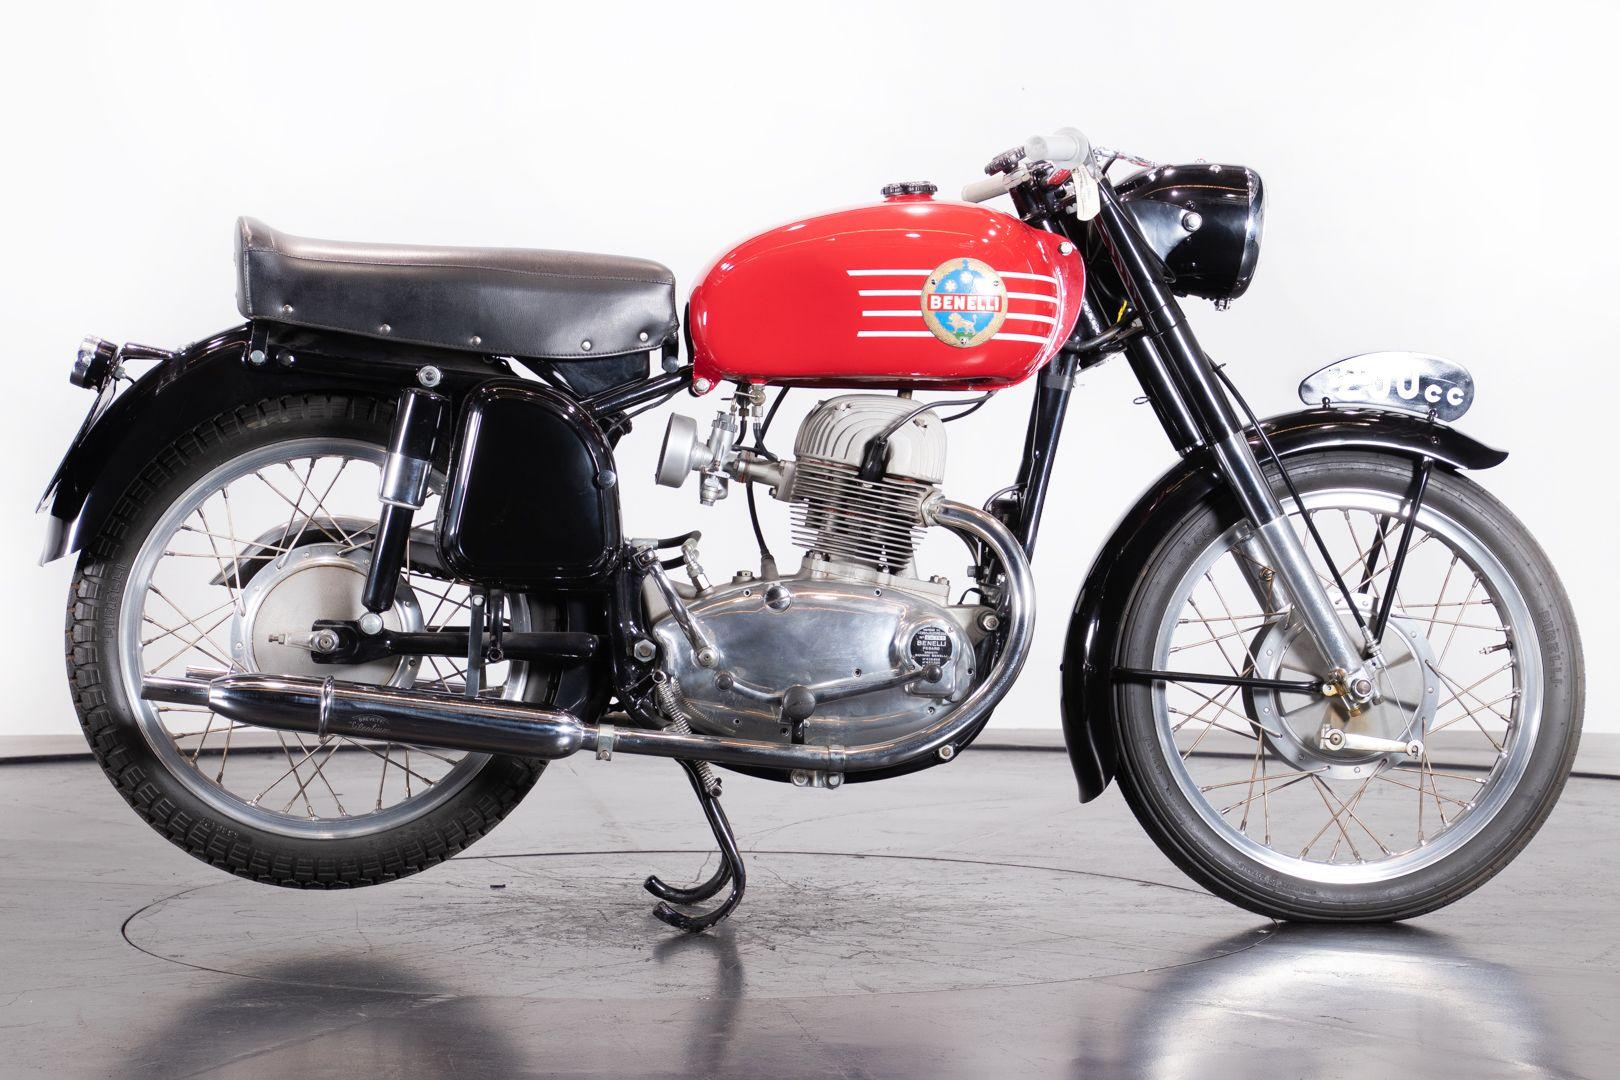 1955 Benelli 250 Leonessa 74304